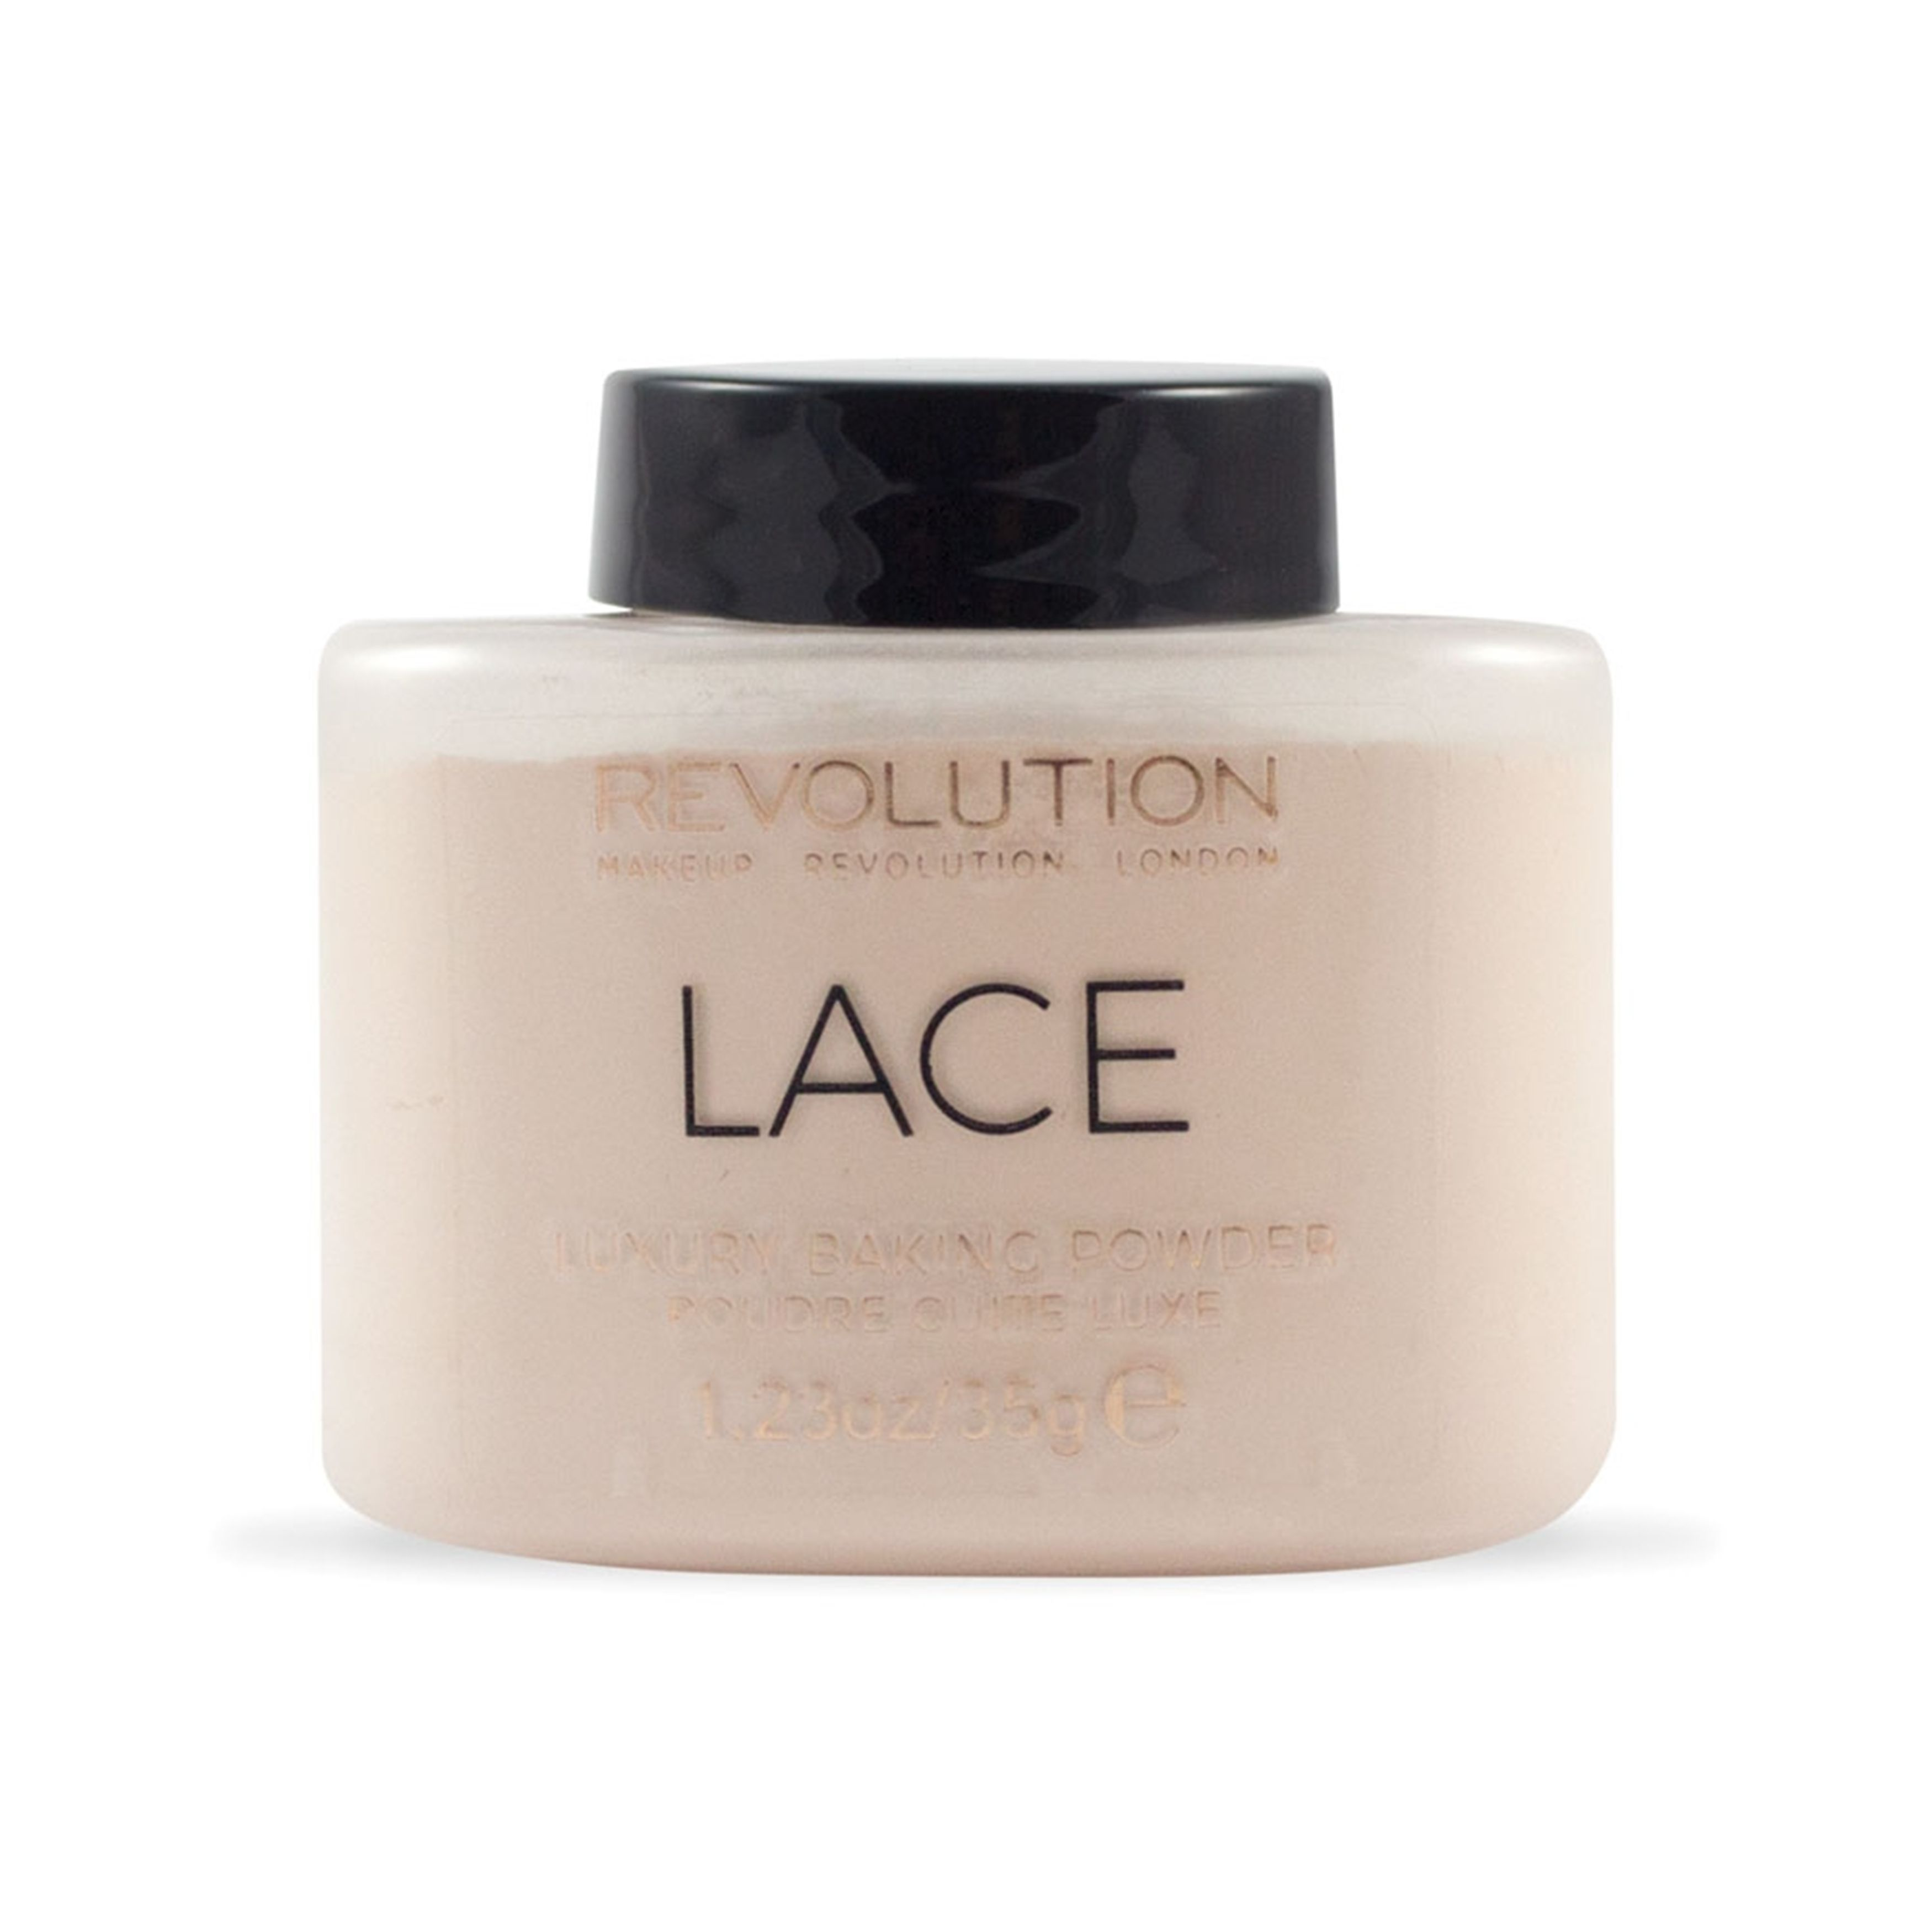 Makeup Revolution Luxury Baking Powder - Lace